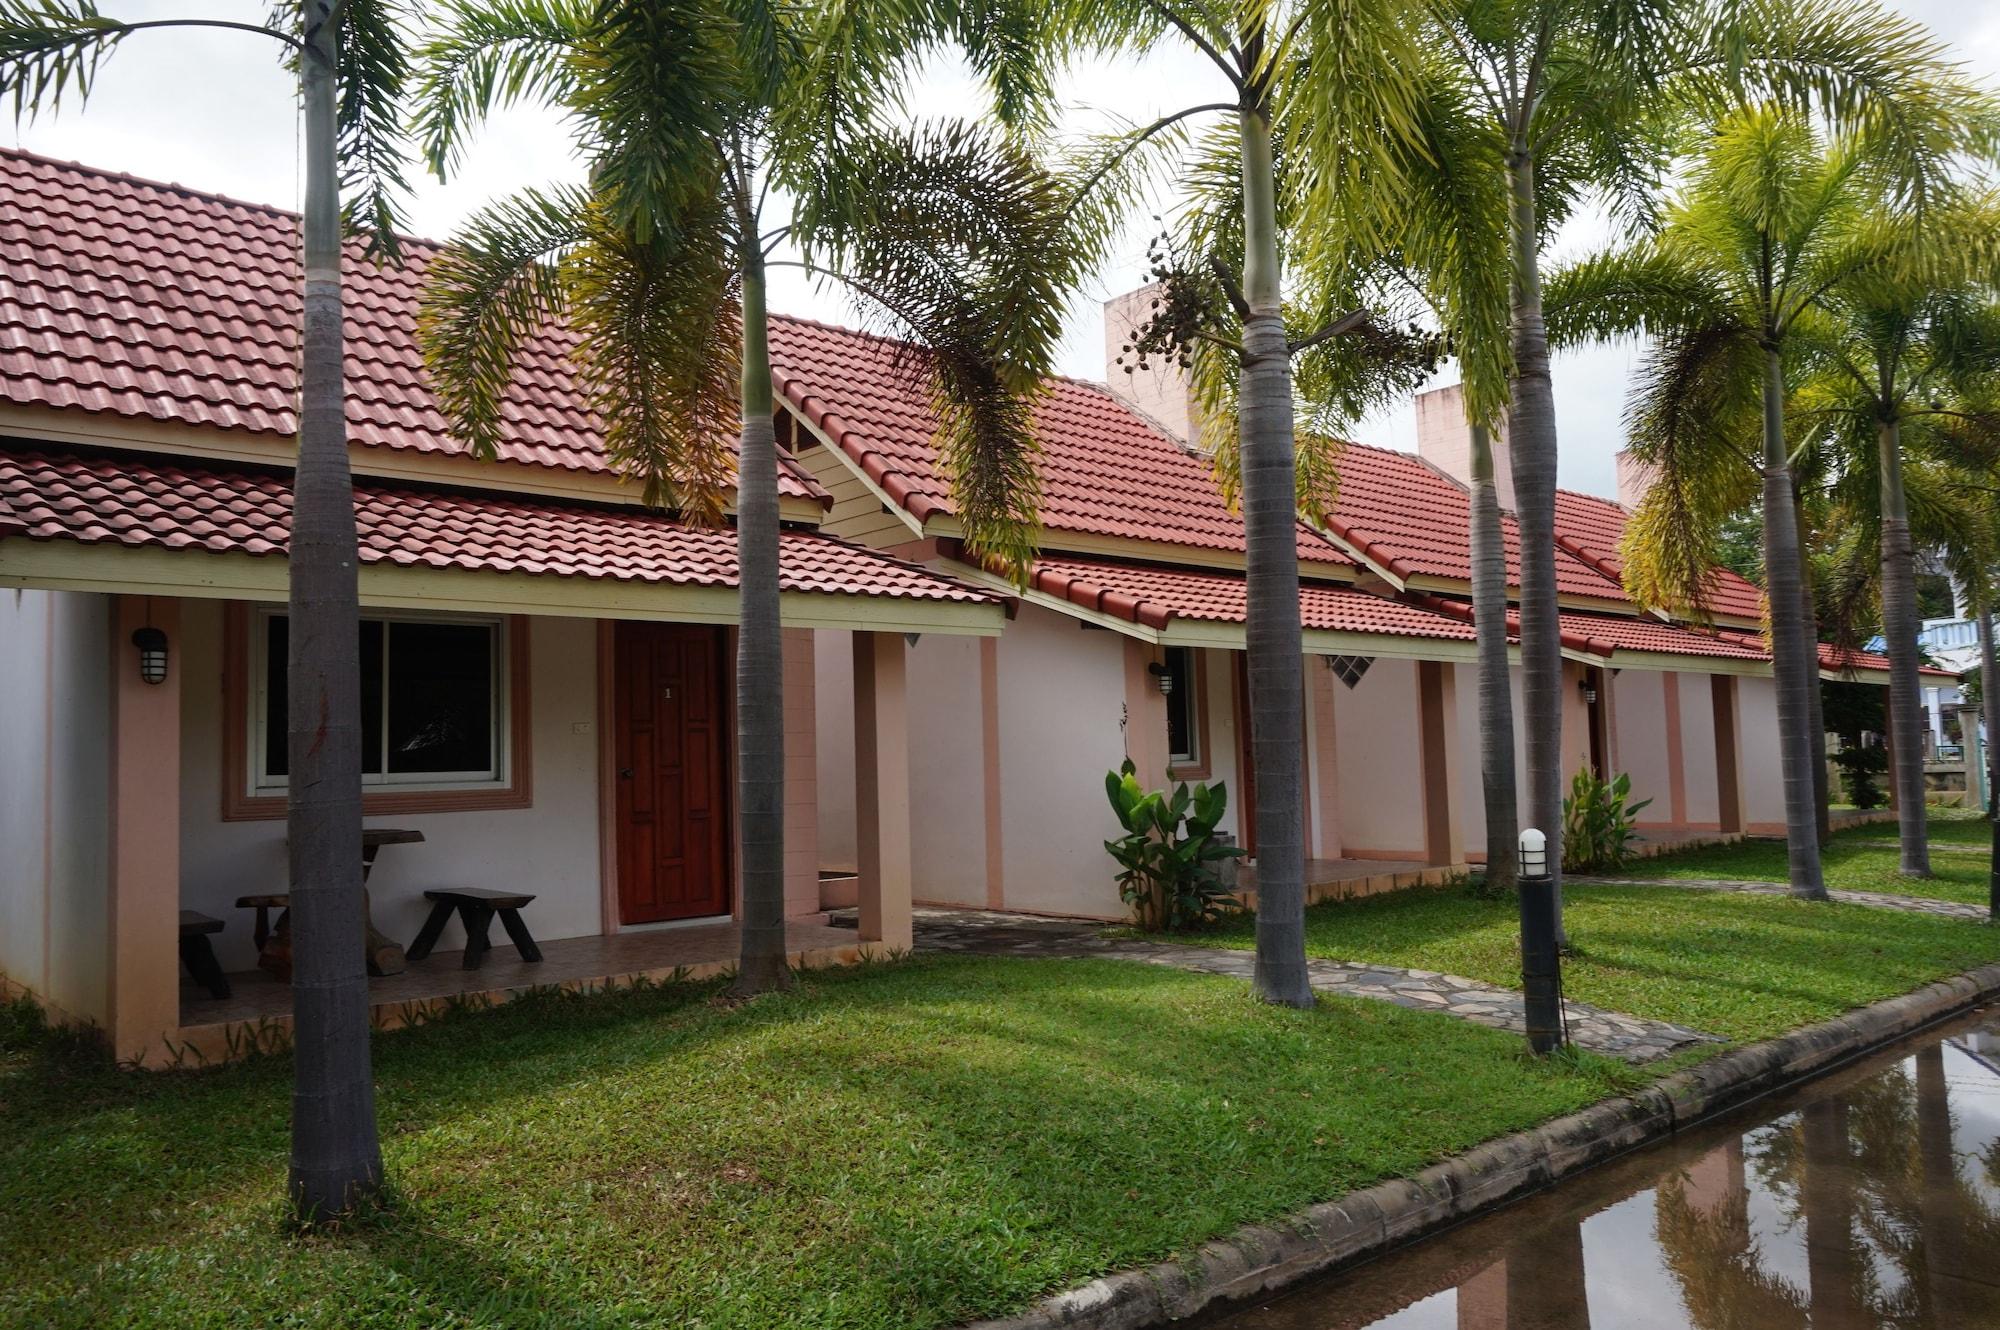 A.P. Garden Hotel, Muang Kalasin